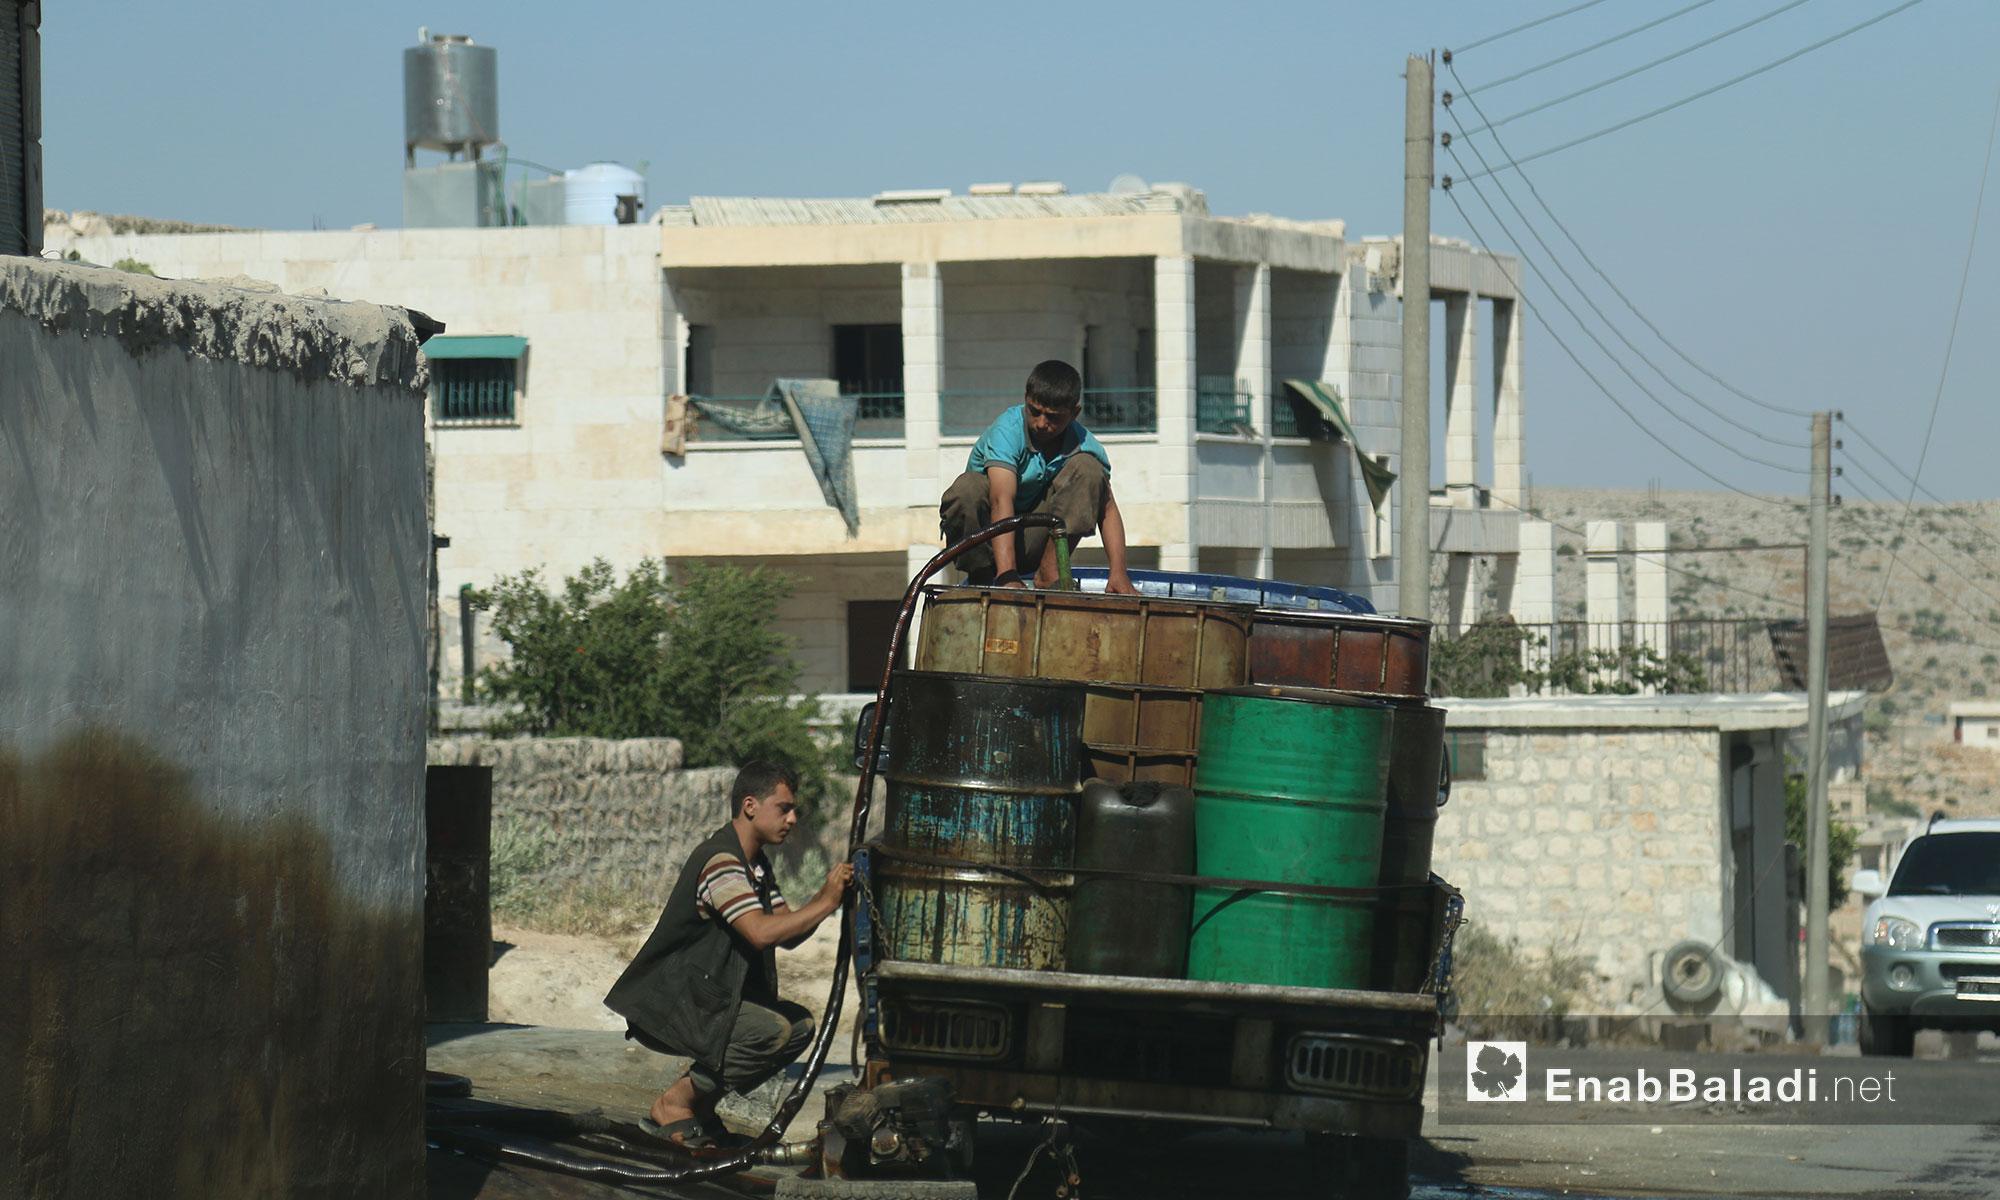 A fuel center in the city of Darat Izza, rural Aleppo – June 12, 2017 (Enab Baladi)